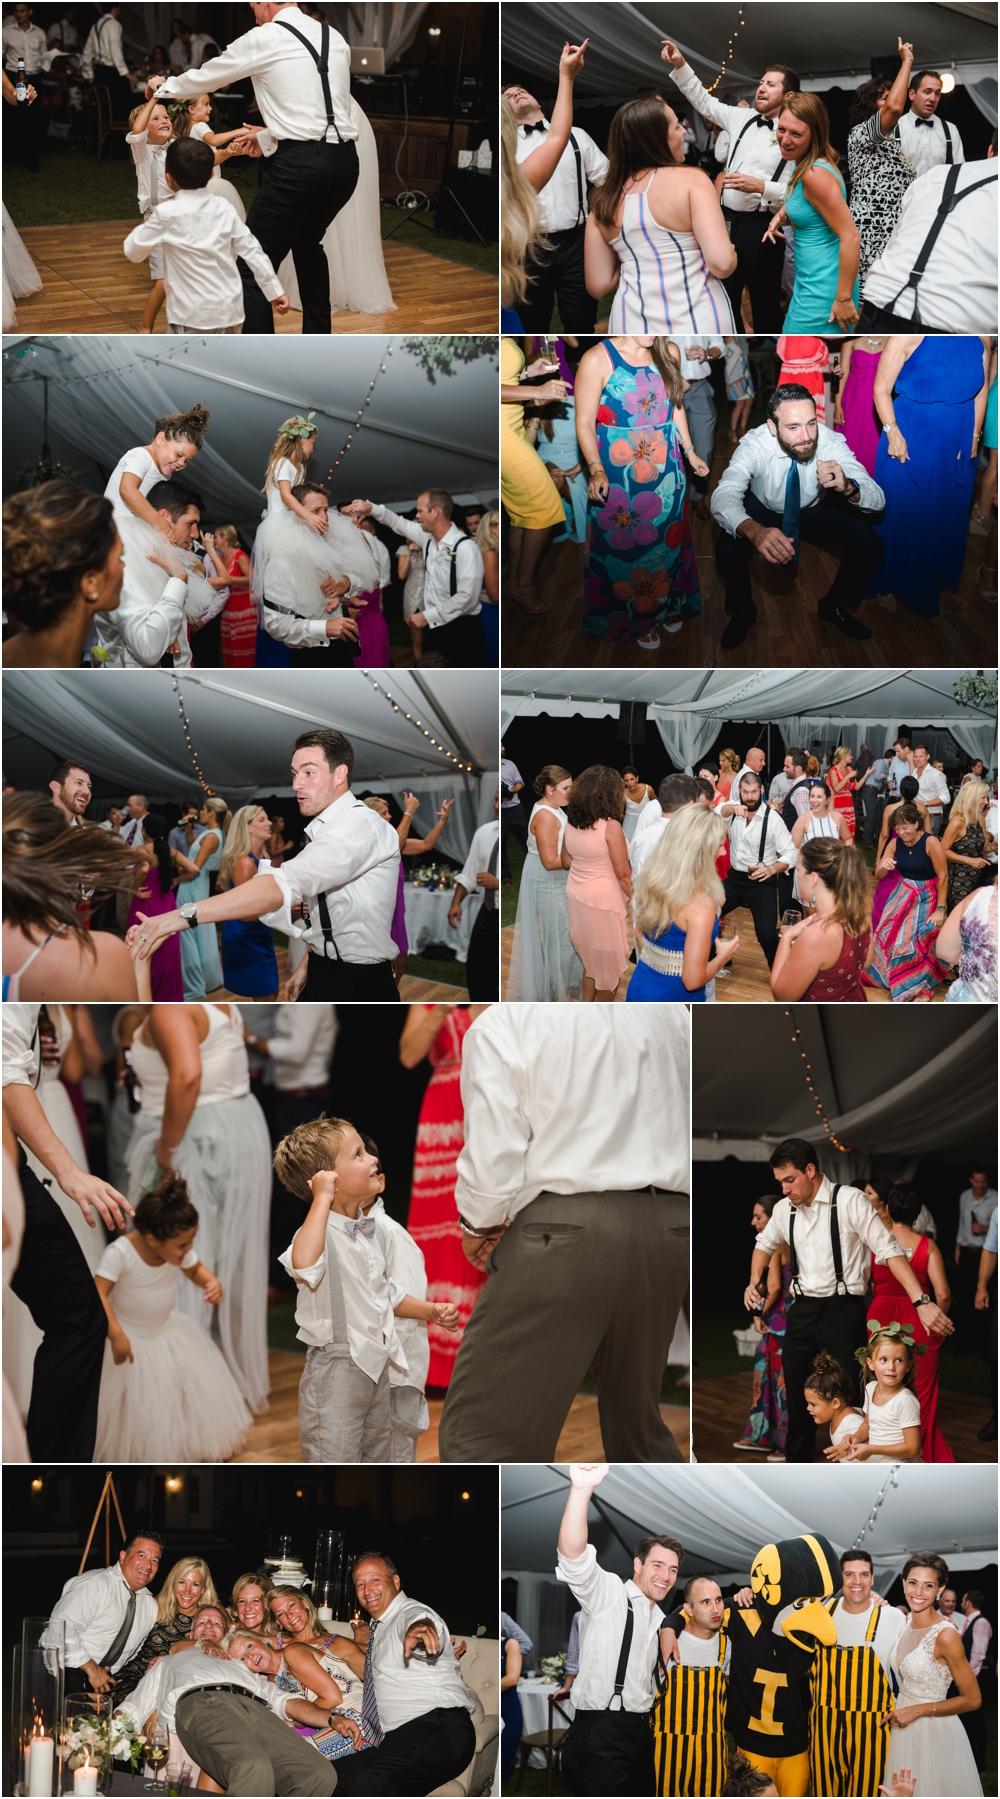 roberts-seaside-florida-wedding-kiersten-grant-photography-180-1.jpg